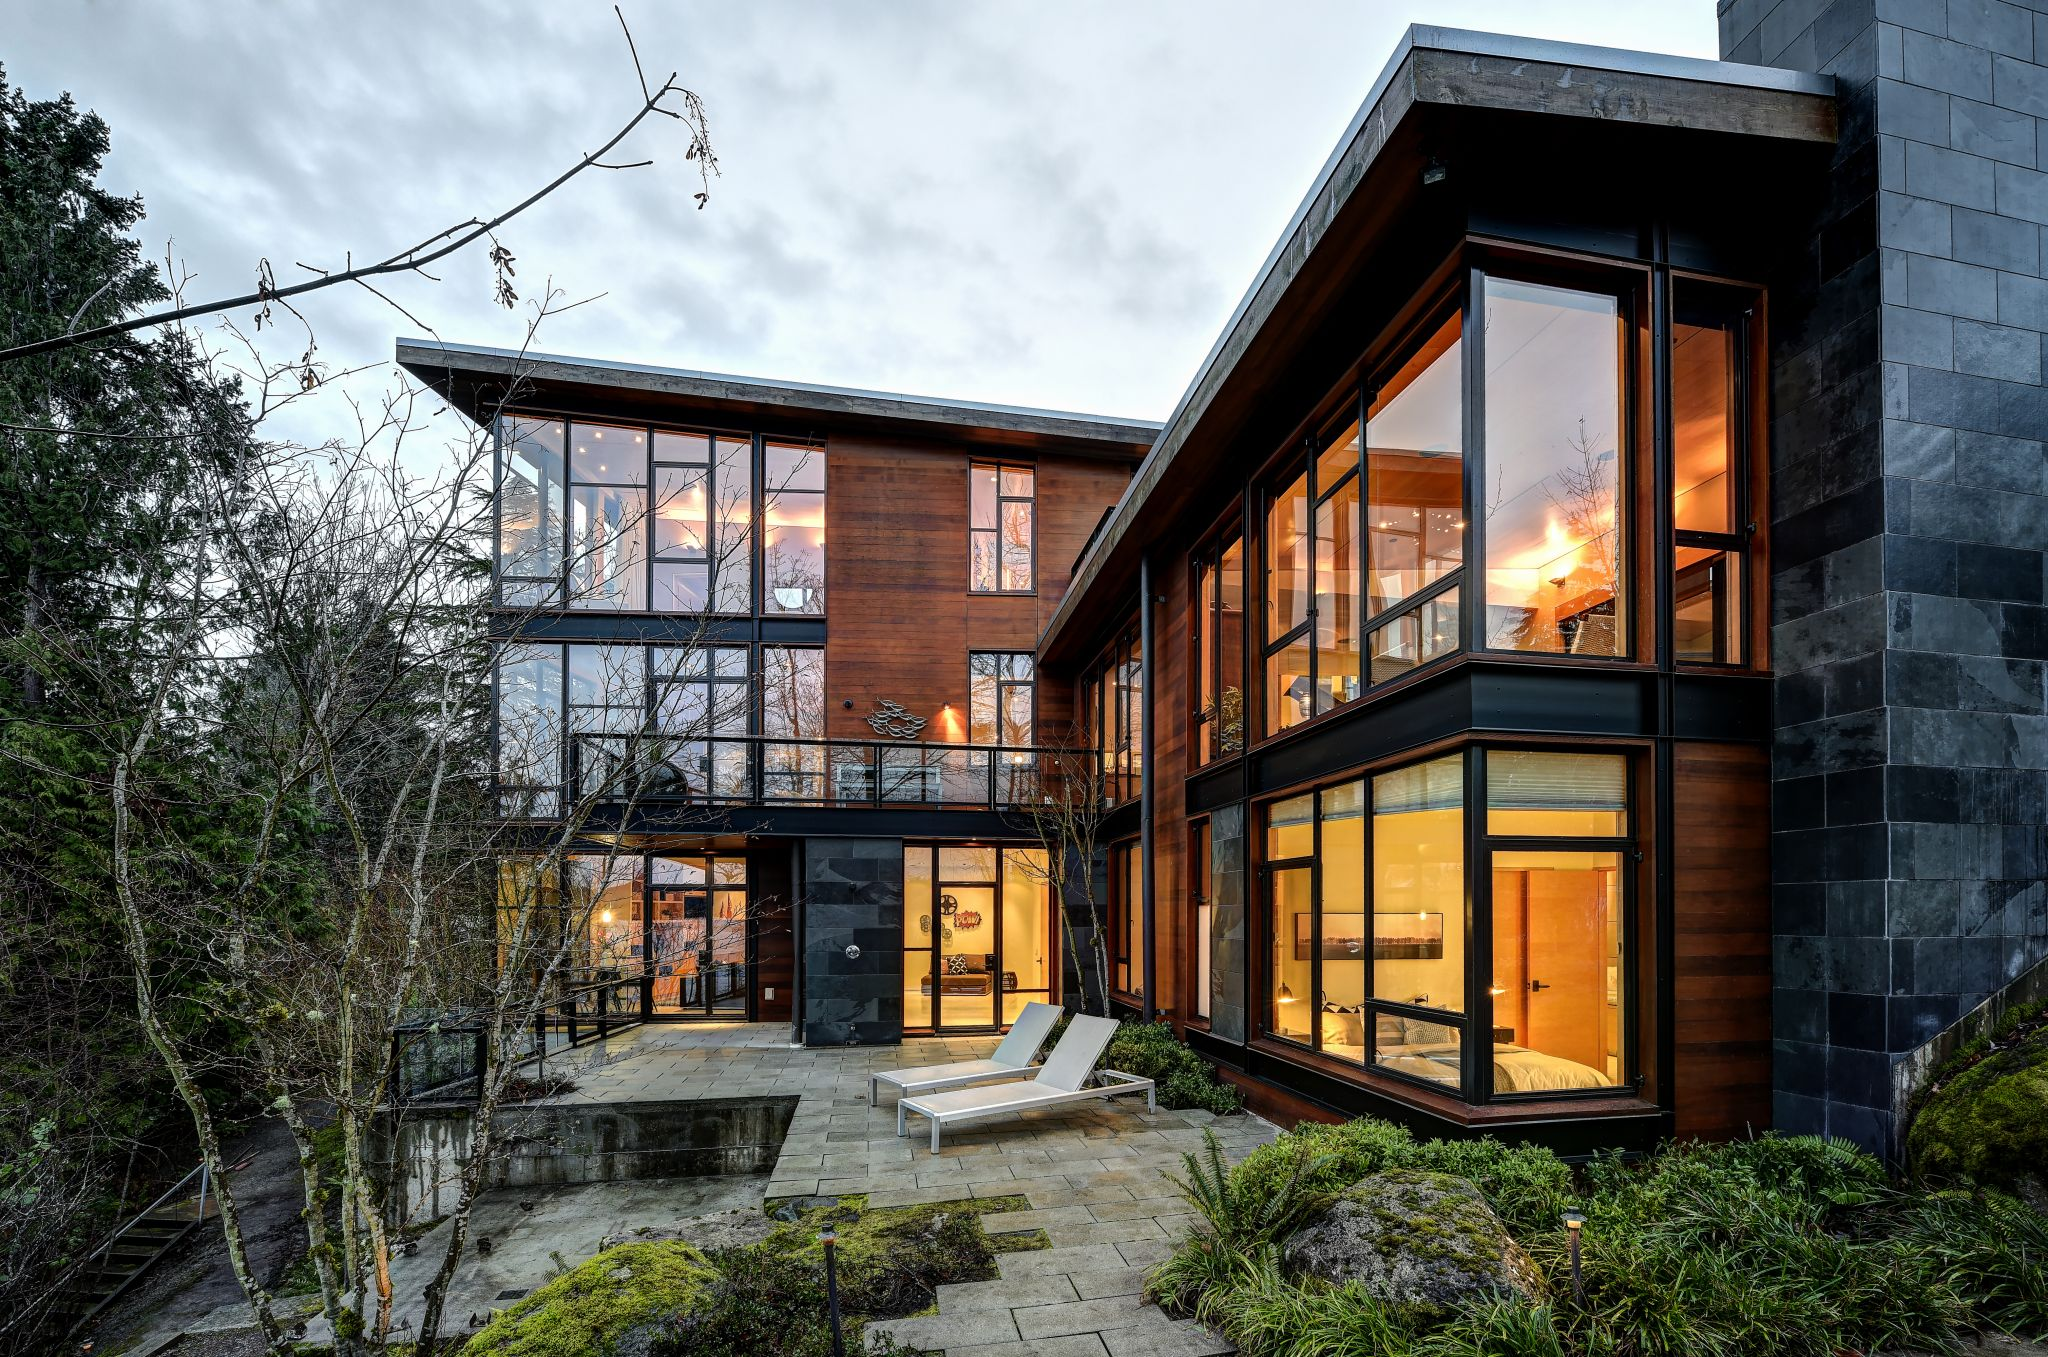 Gorgeous Prentiss-designed custom waterfront home asks $4.2M